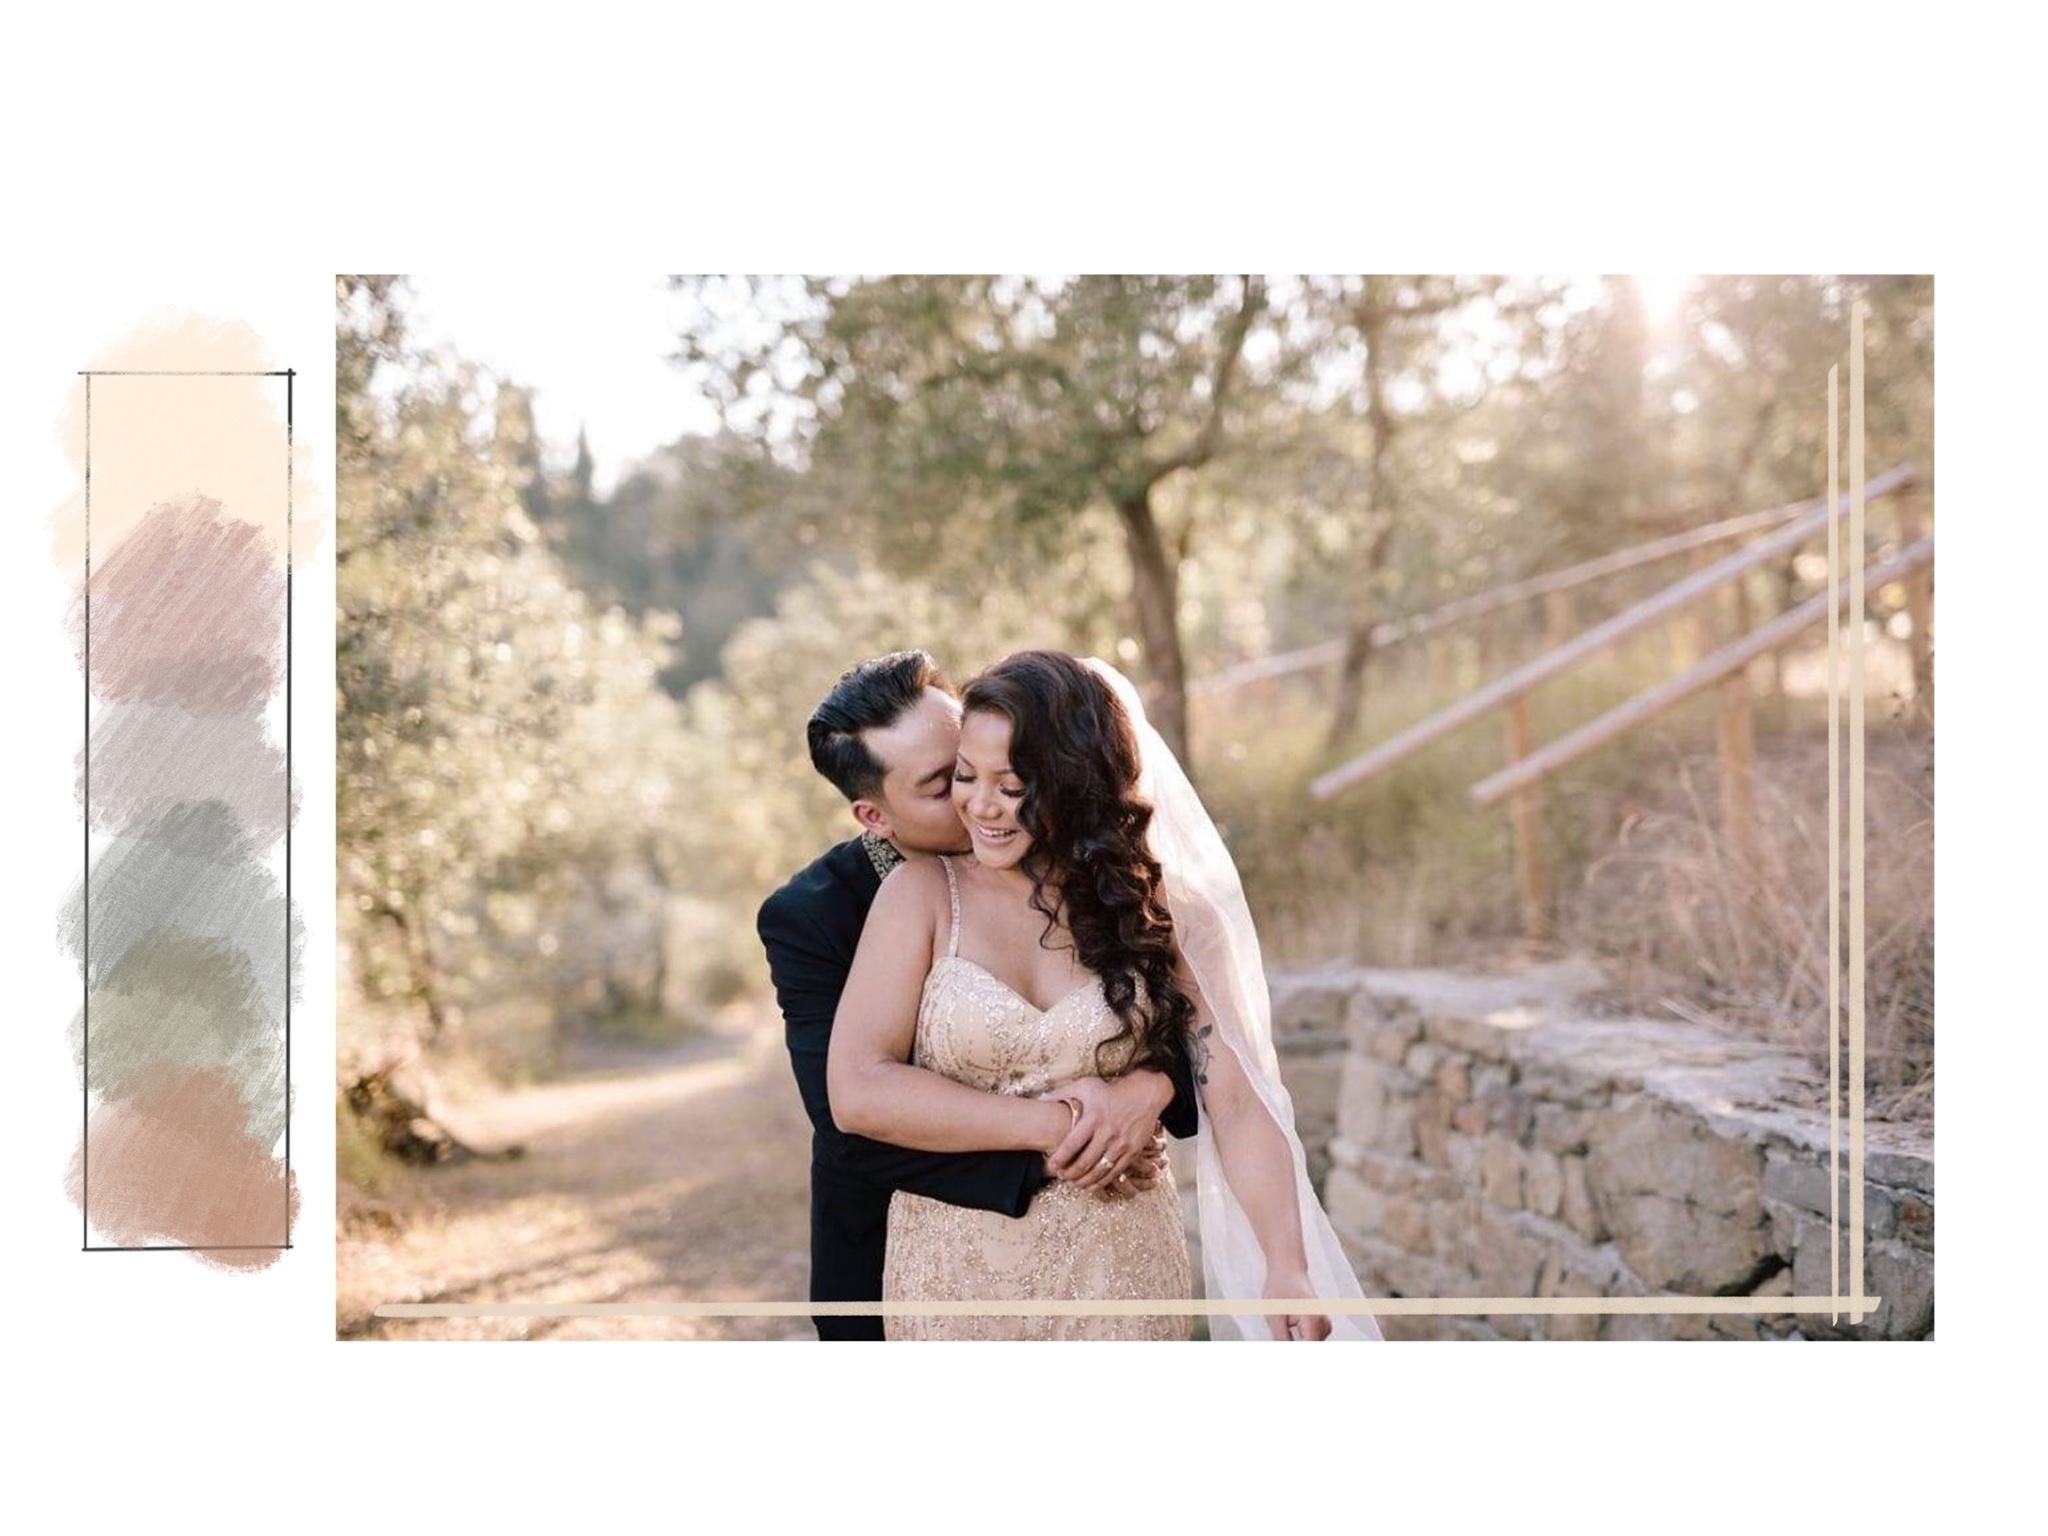 Wedding Photo & Video Tuscany